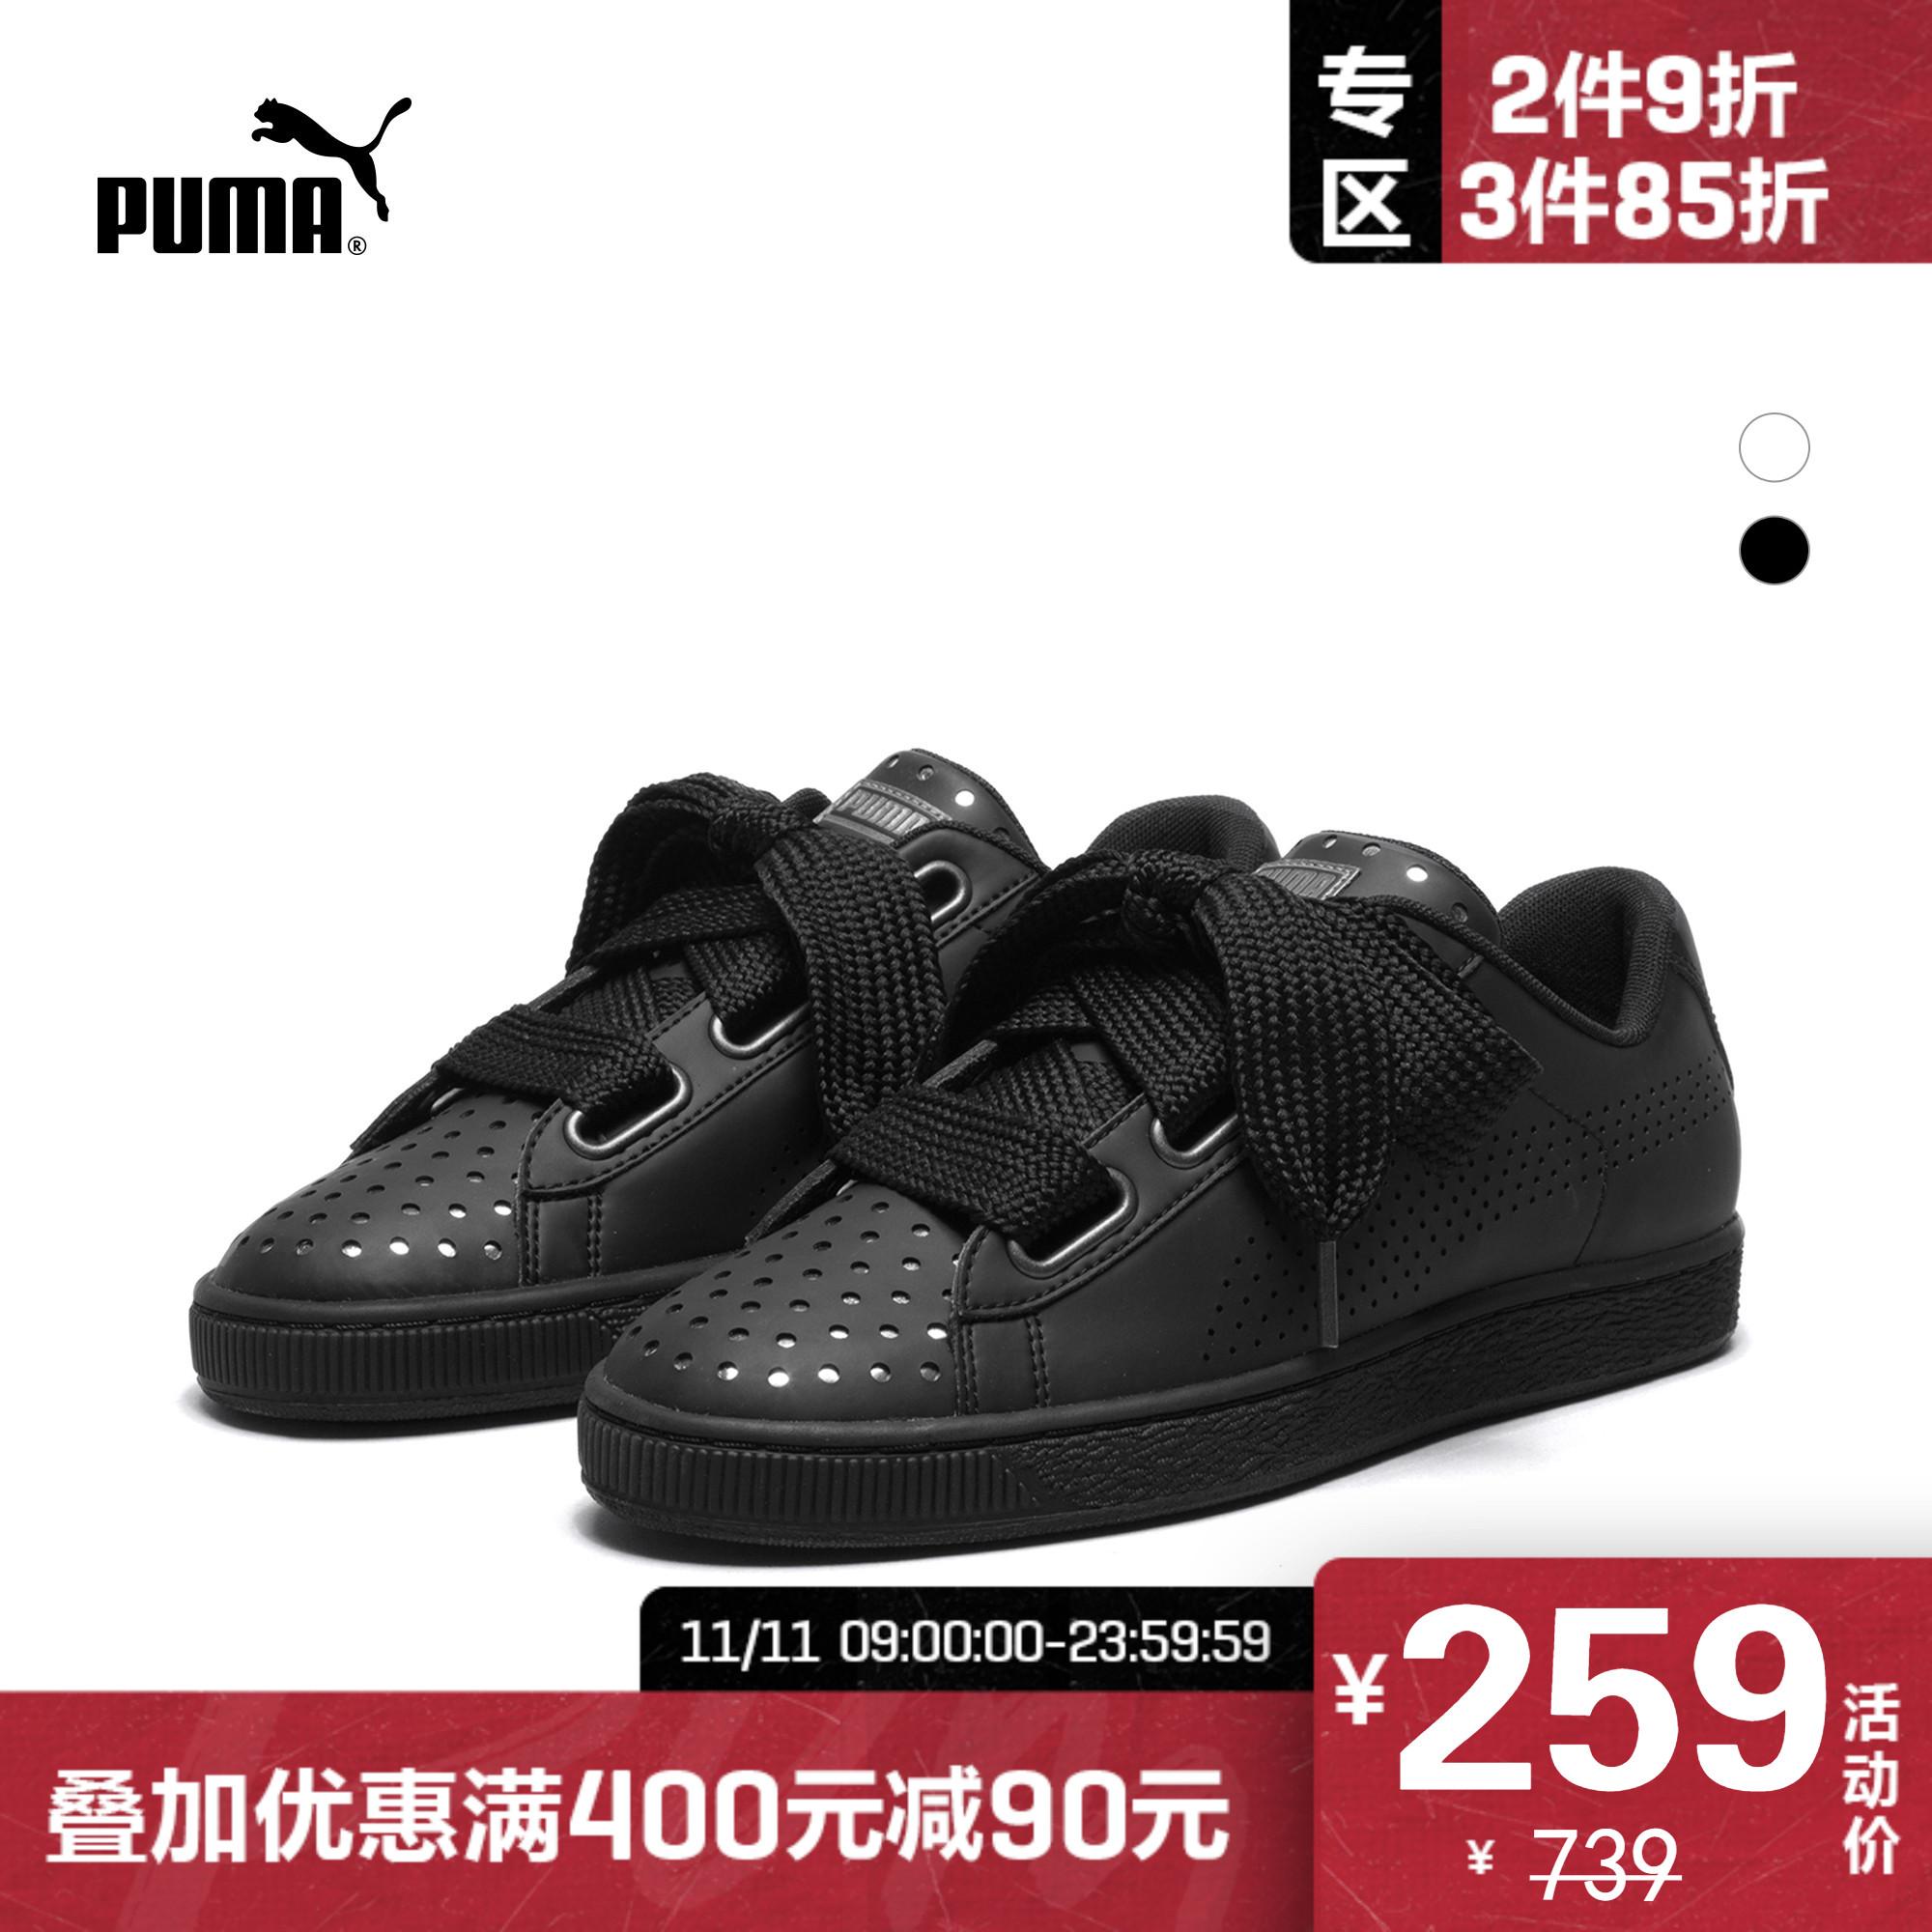 PUMA彪馬官方 女子休閑鞋 Basket Heart Ath Lux 366728